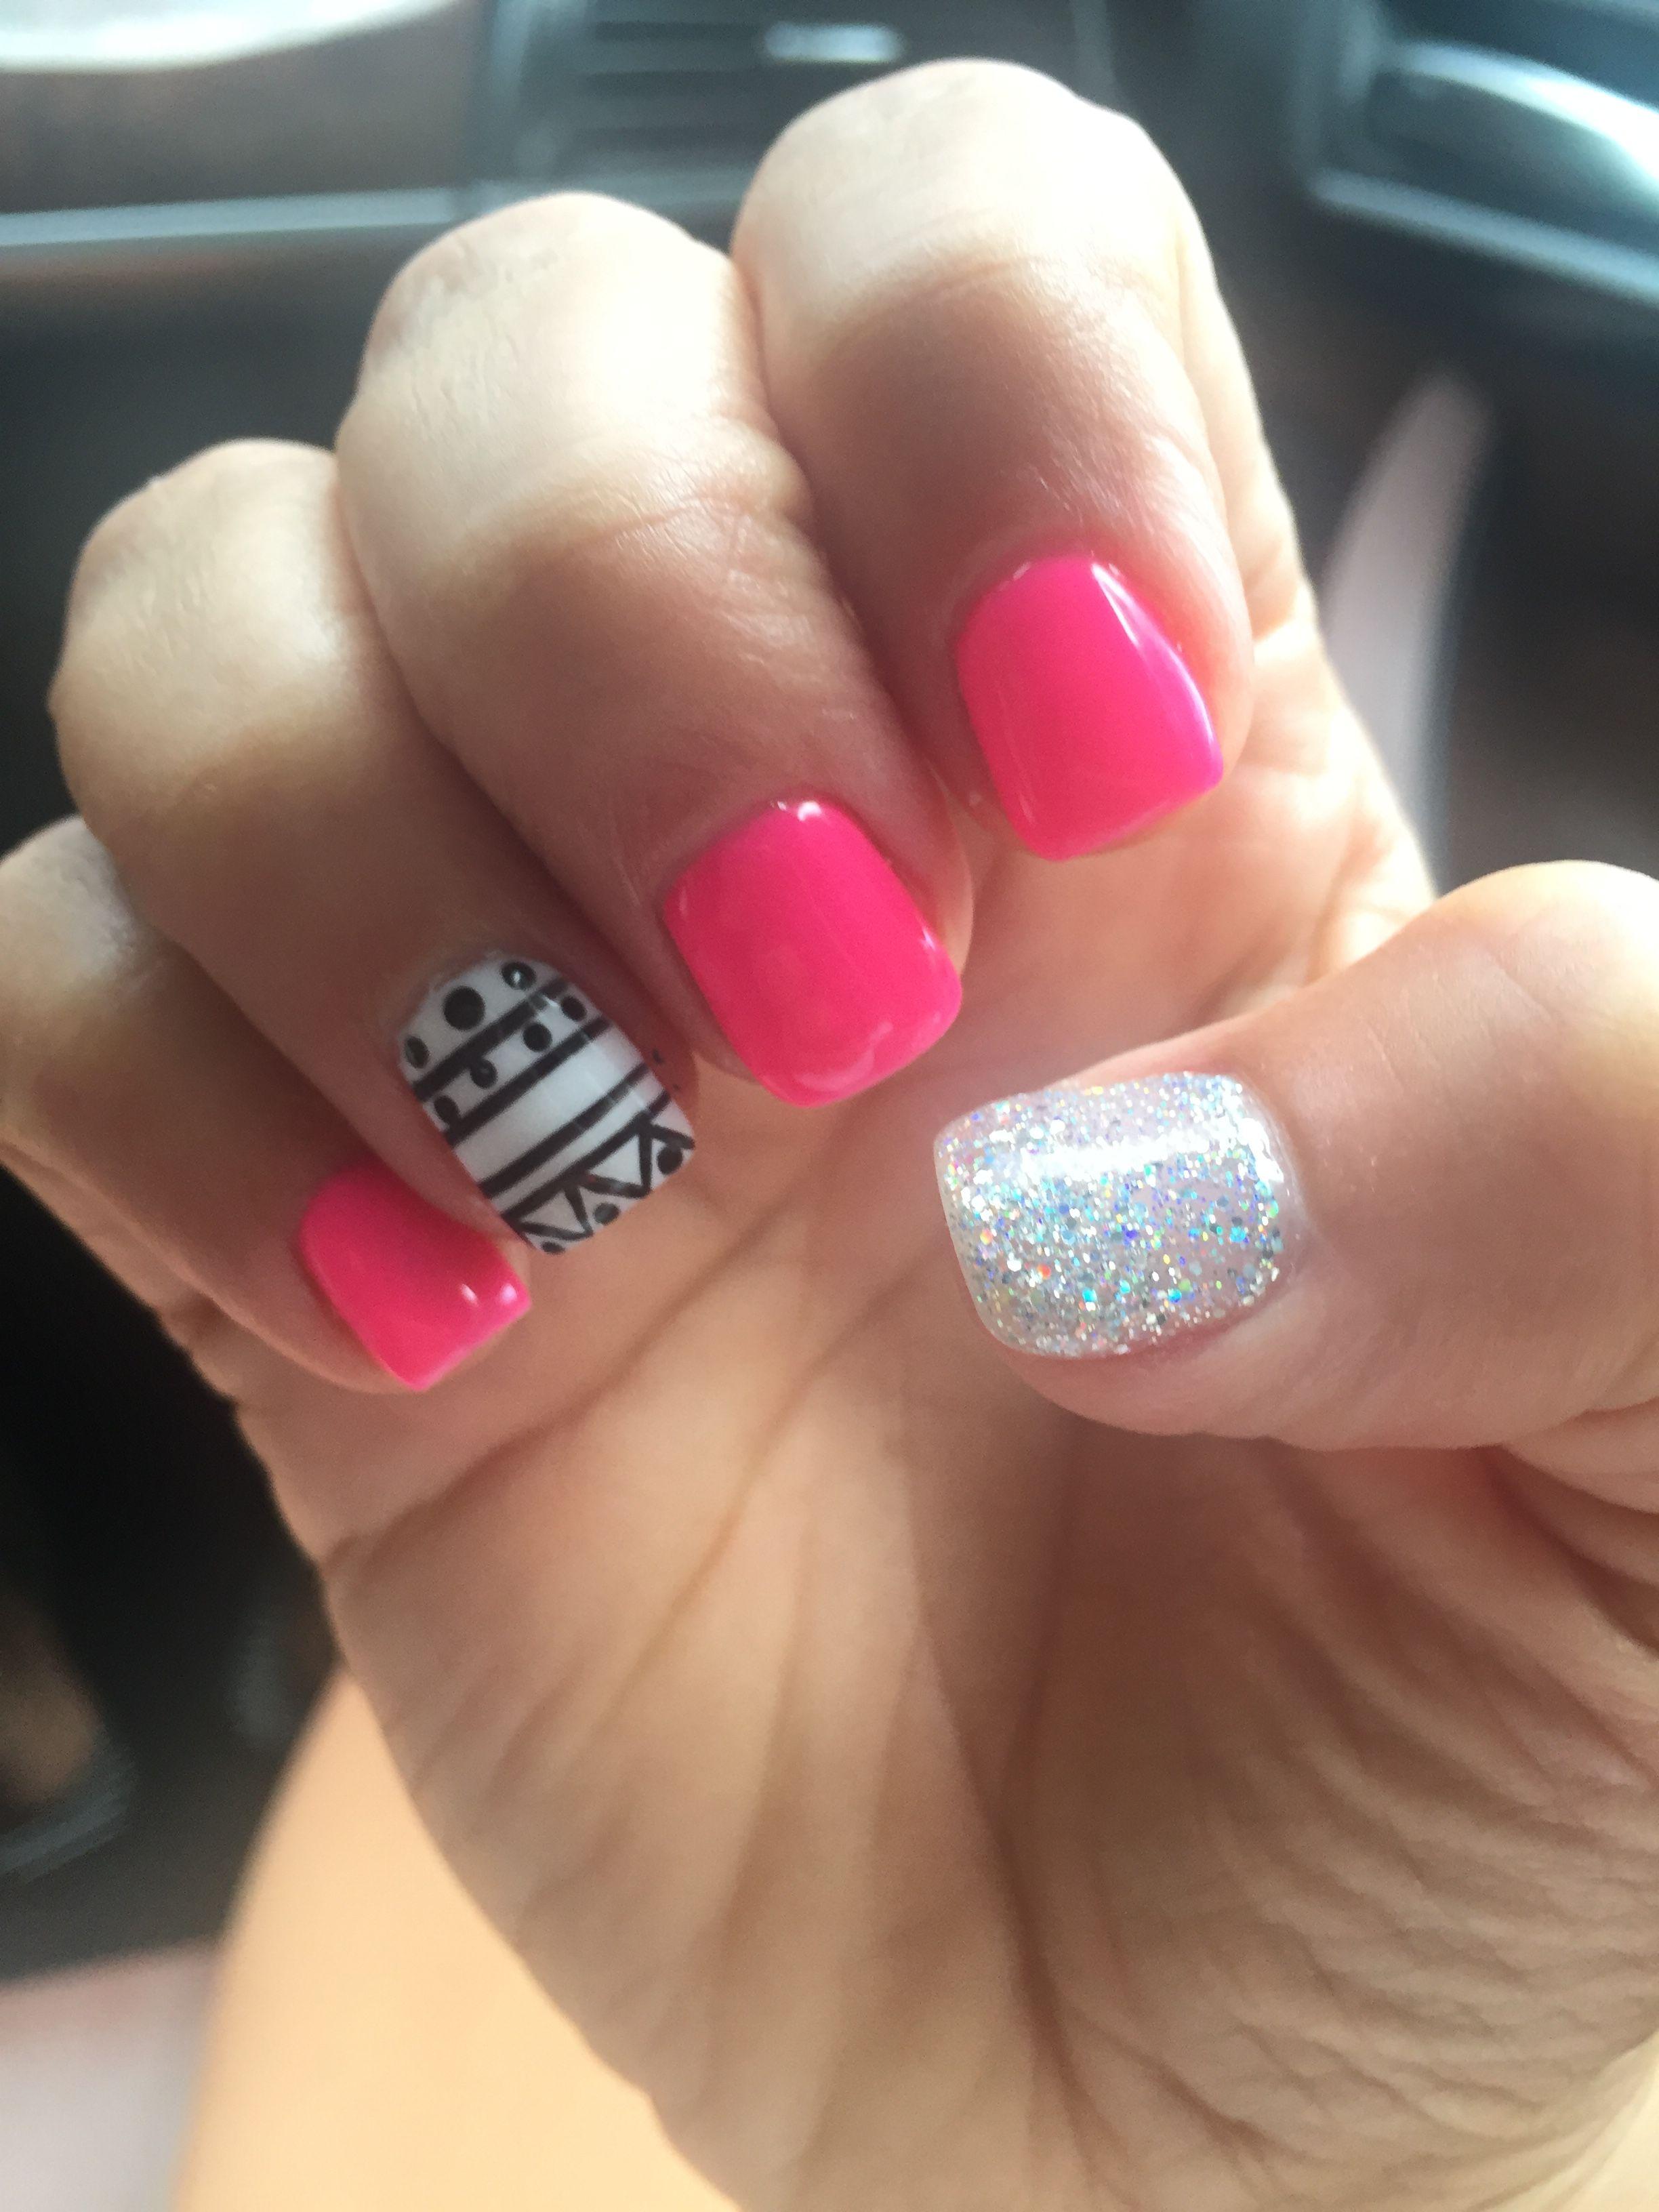 Summer Aztec Nail Design Hot Pink Nails Gel Shellac Mani Glitter